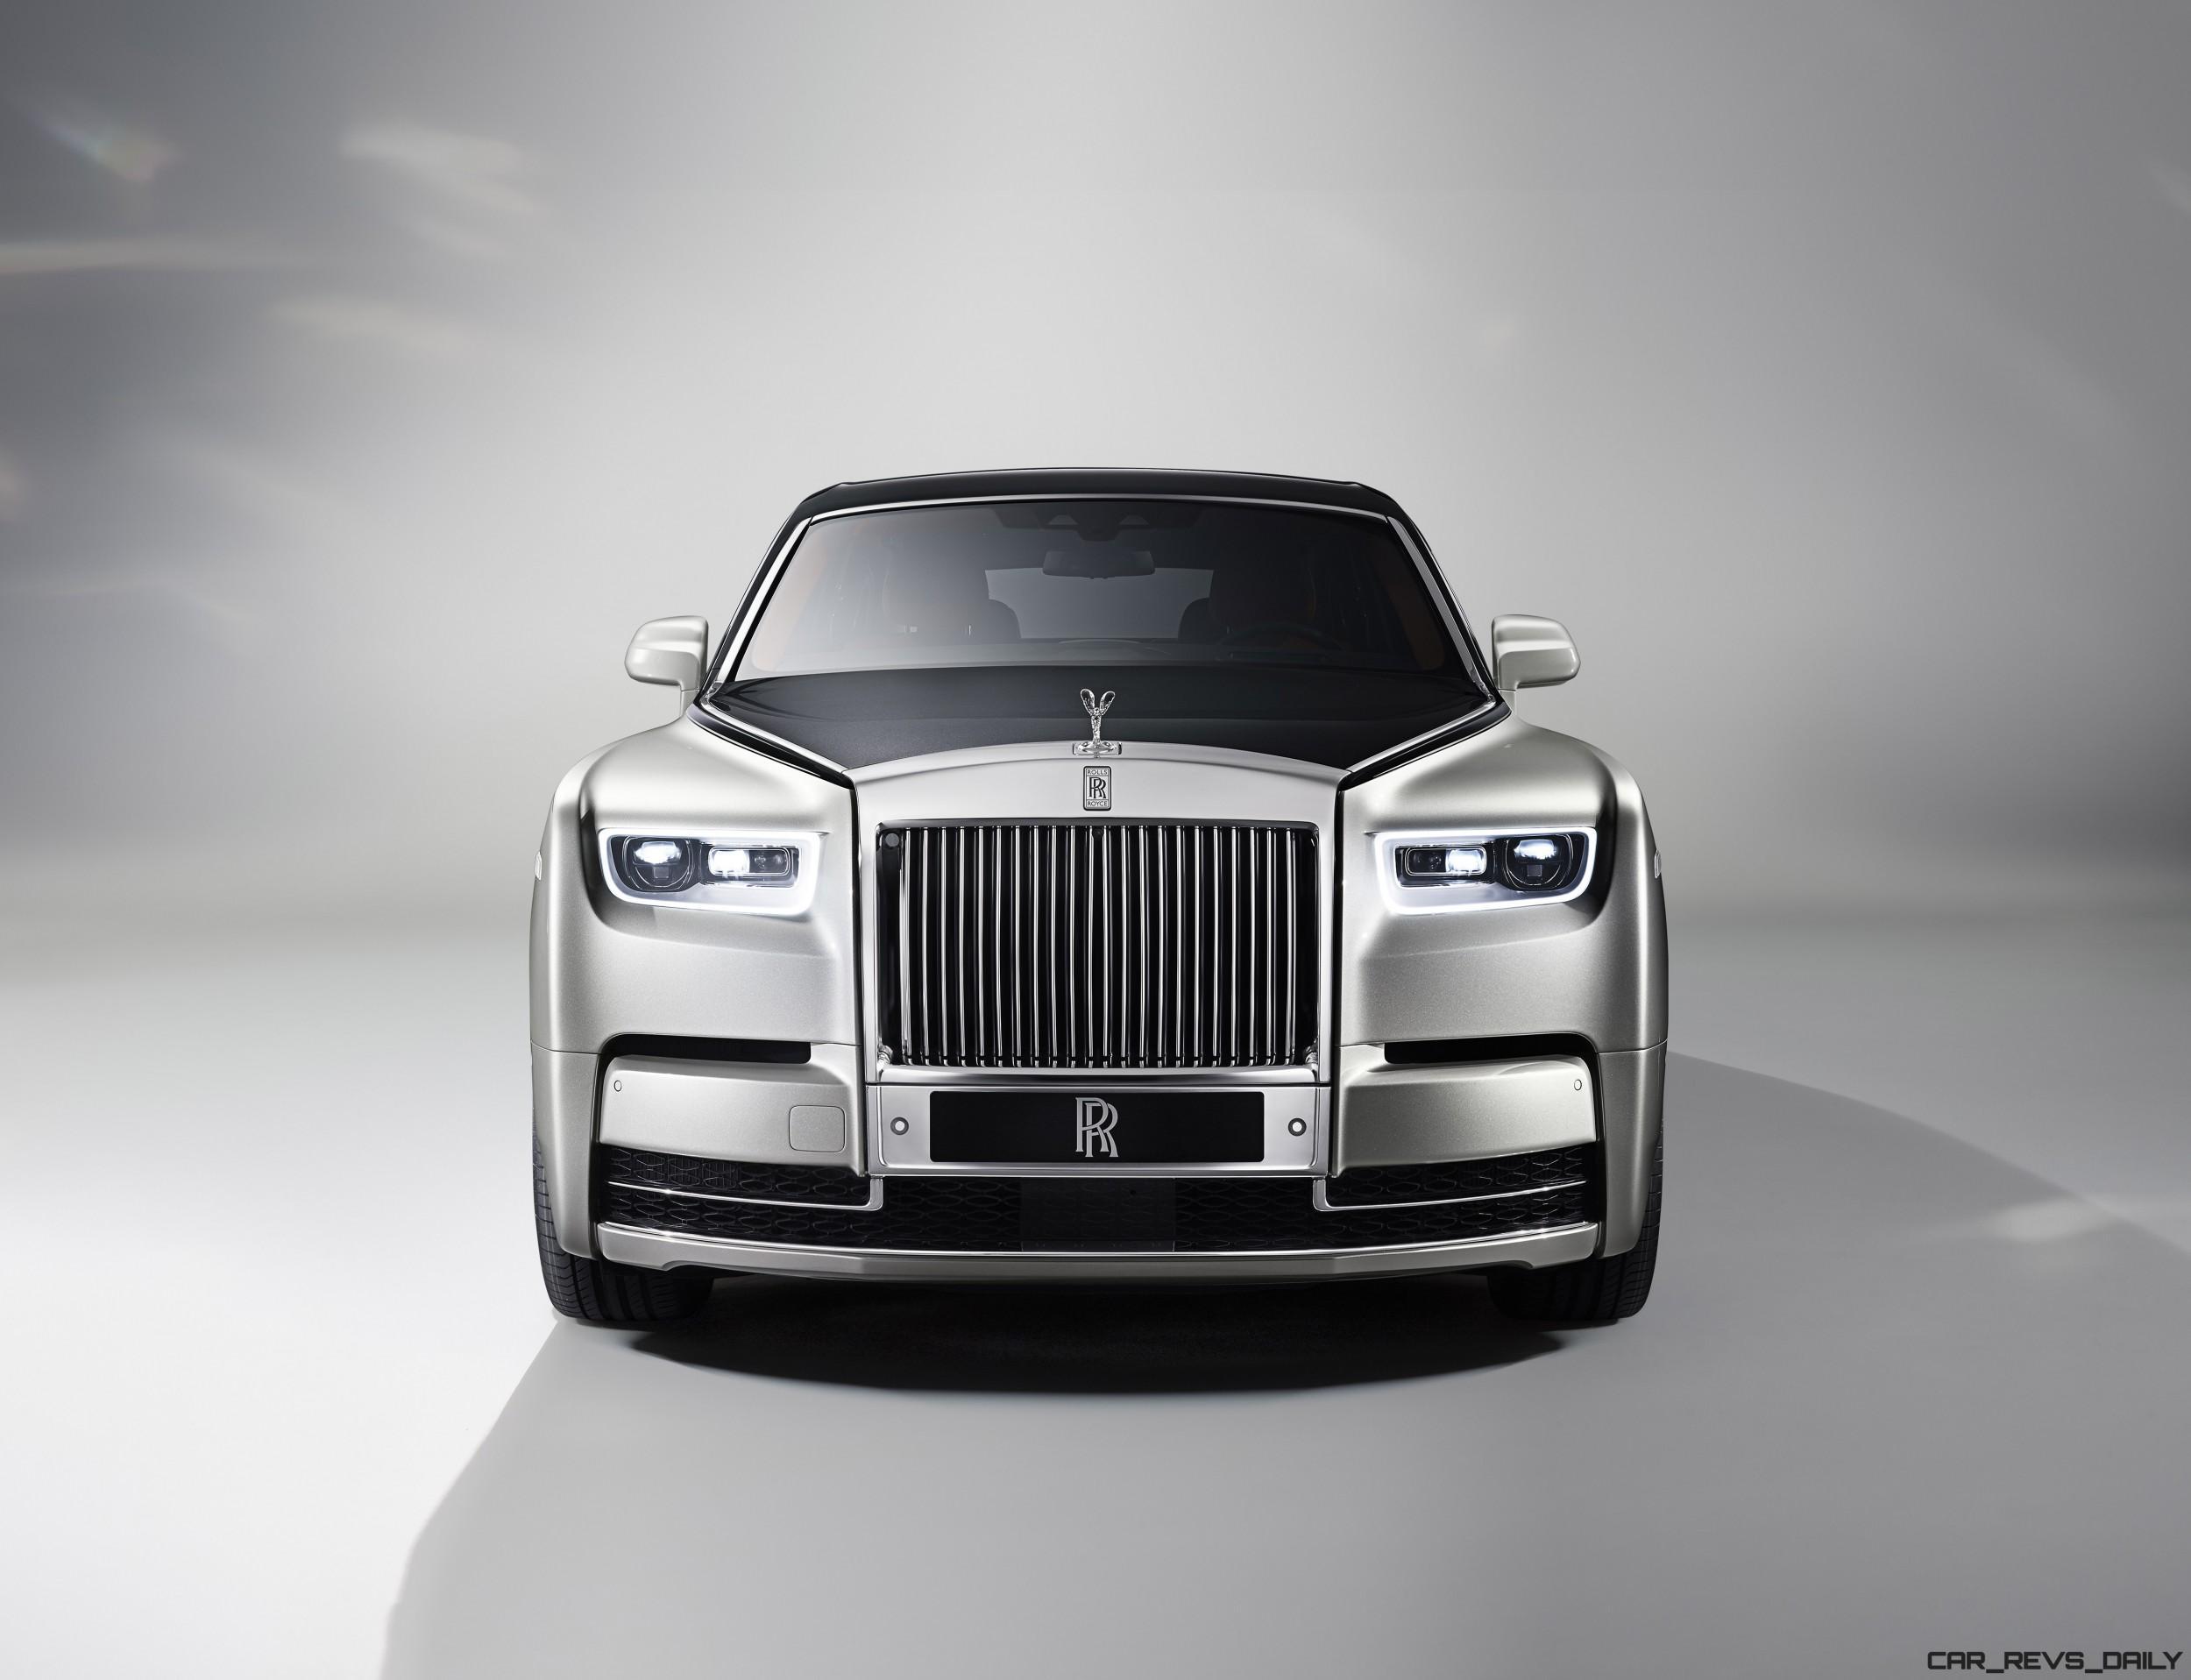 2018 Rolls-Royce PHANTOM 8 Revealed - Video and 30-Photo ...